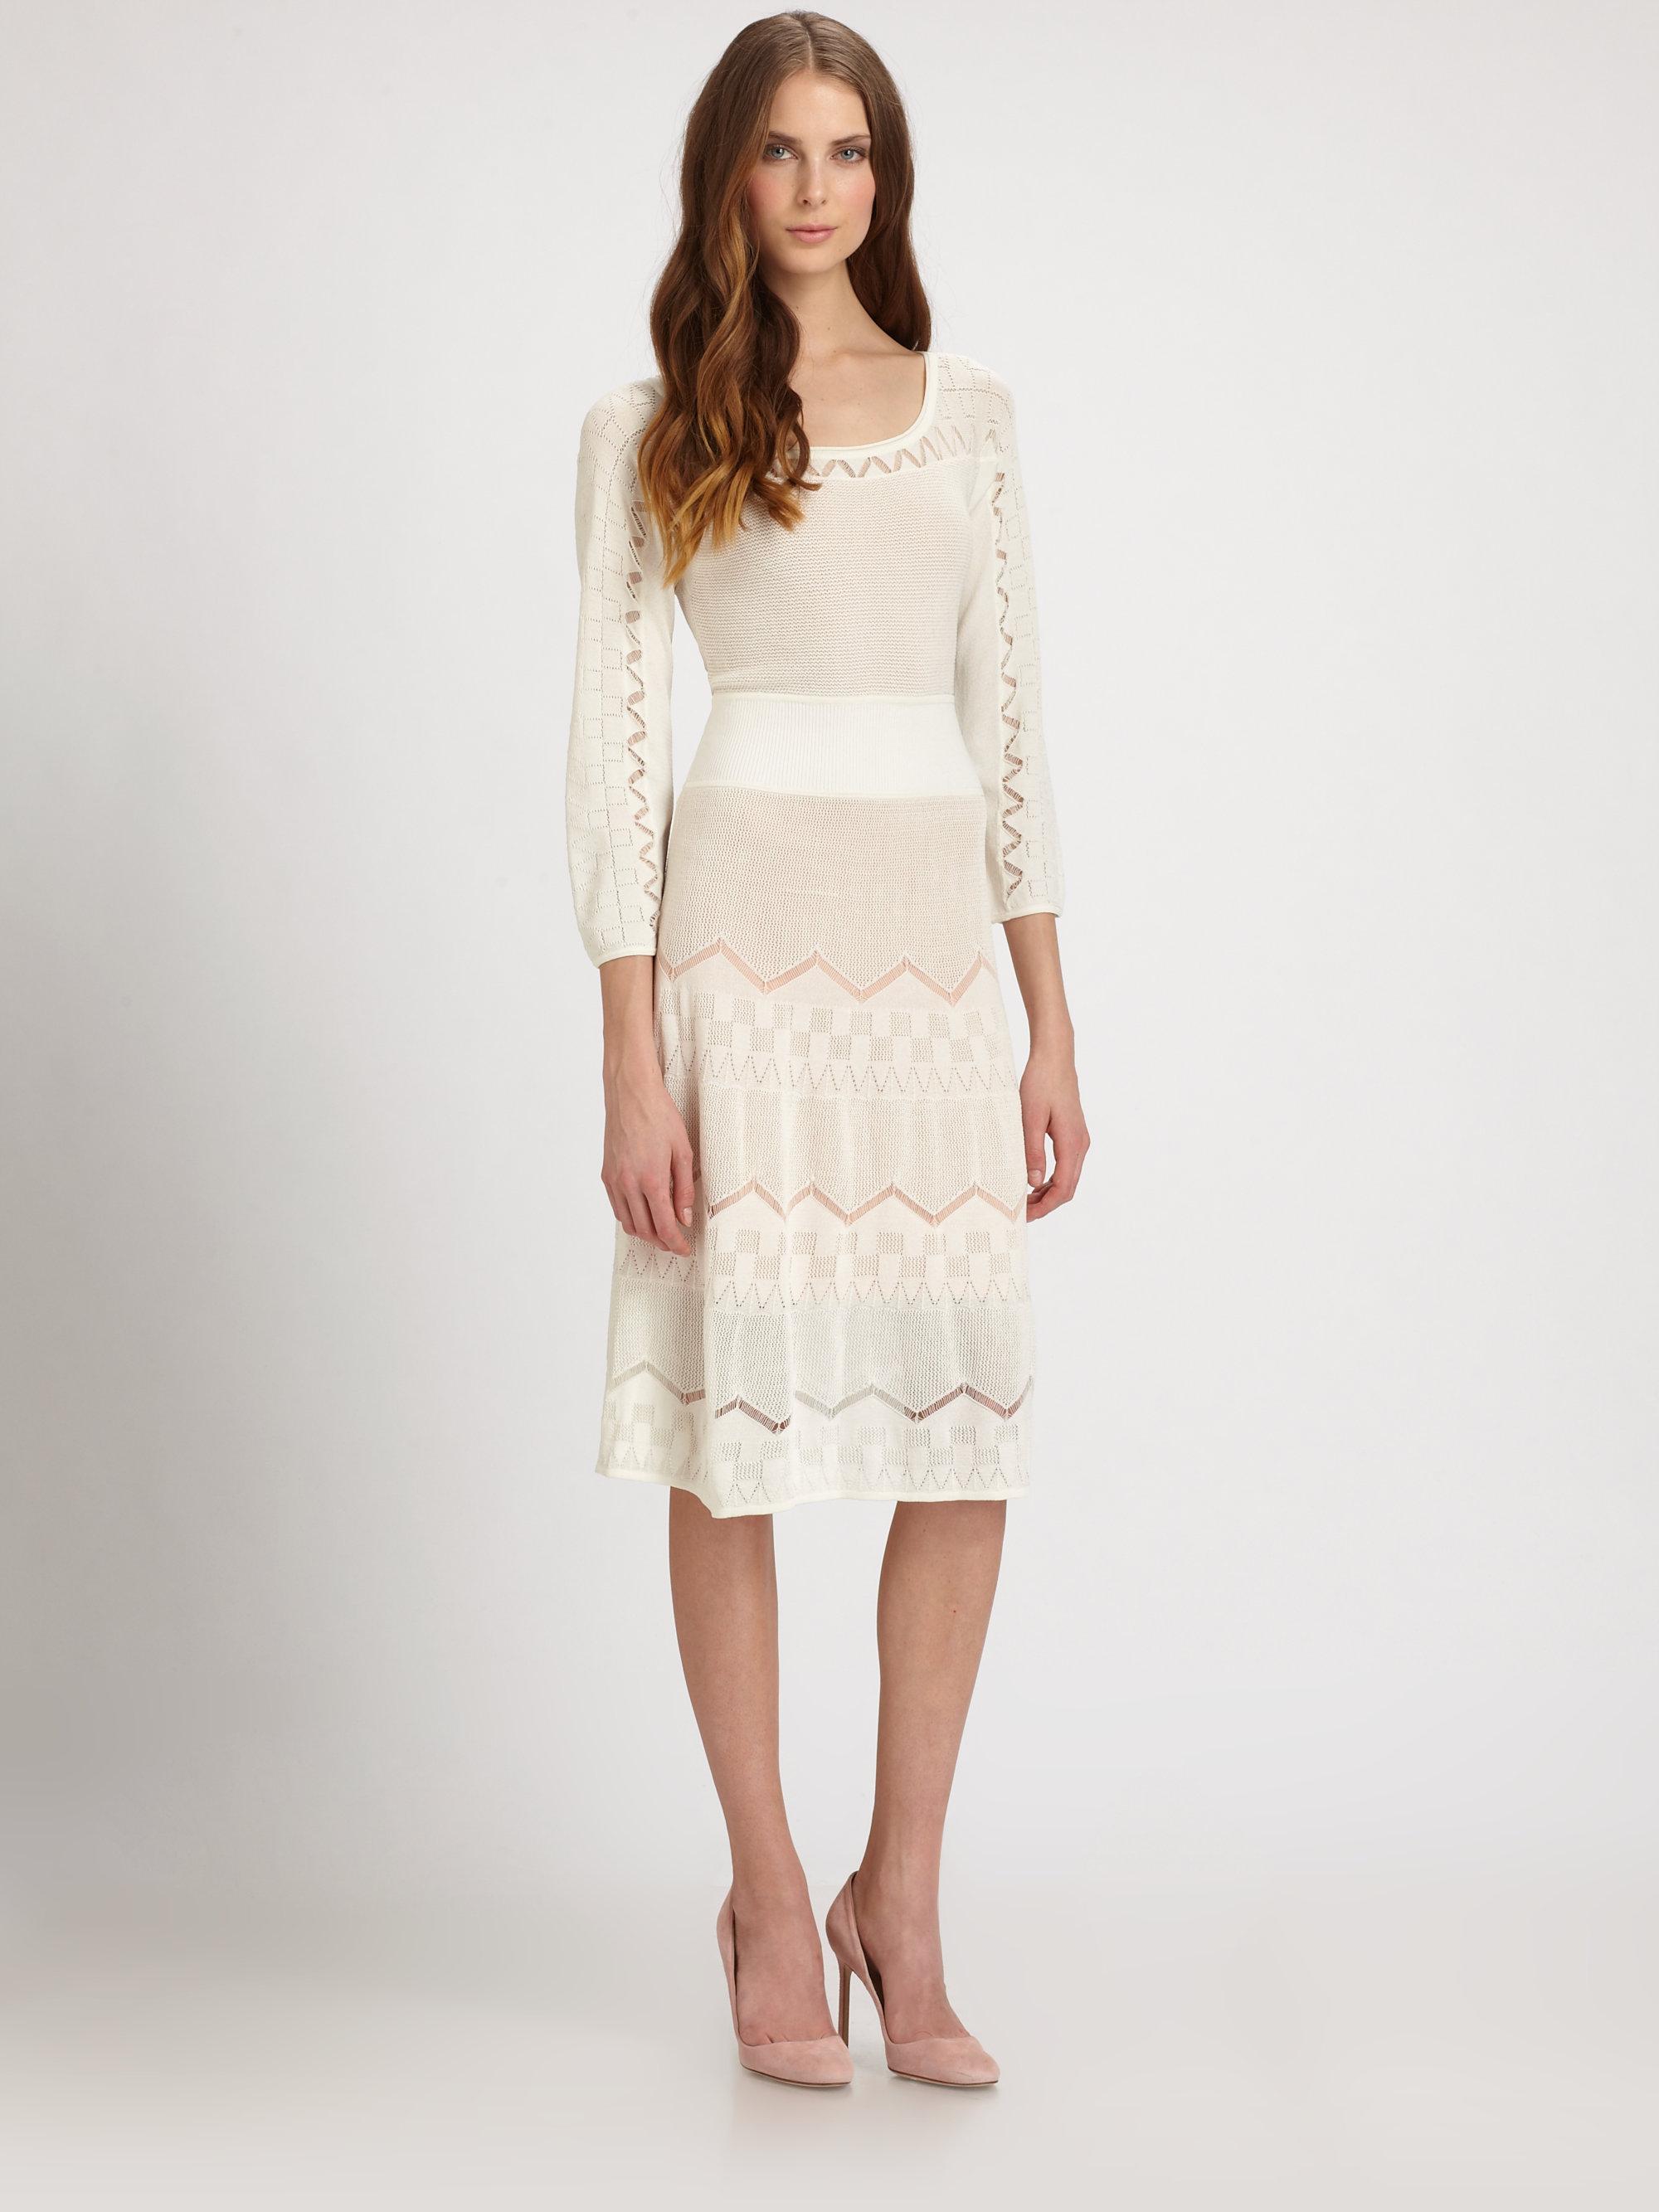 Lyst Catherine Malandrino Pointelle Knit Dress In White